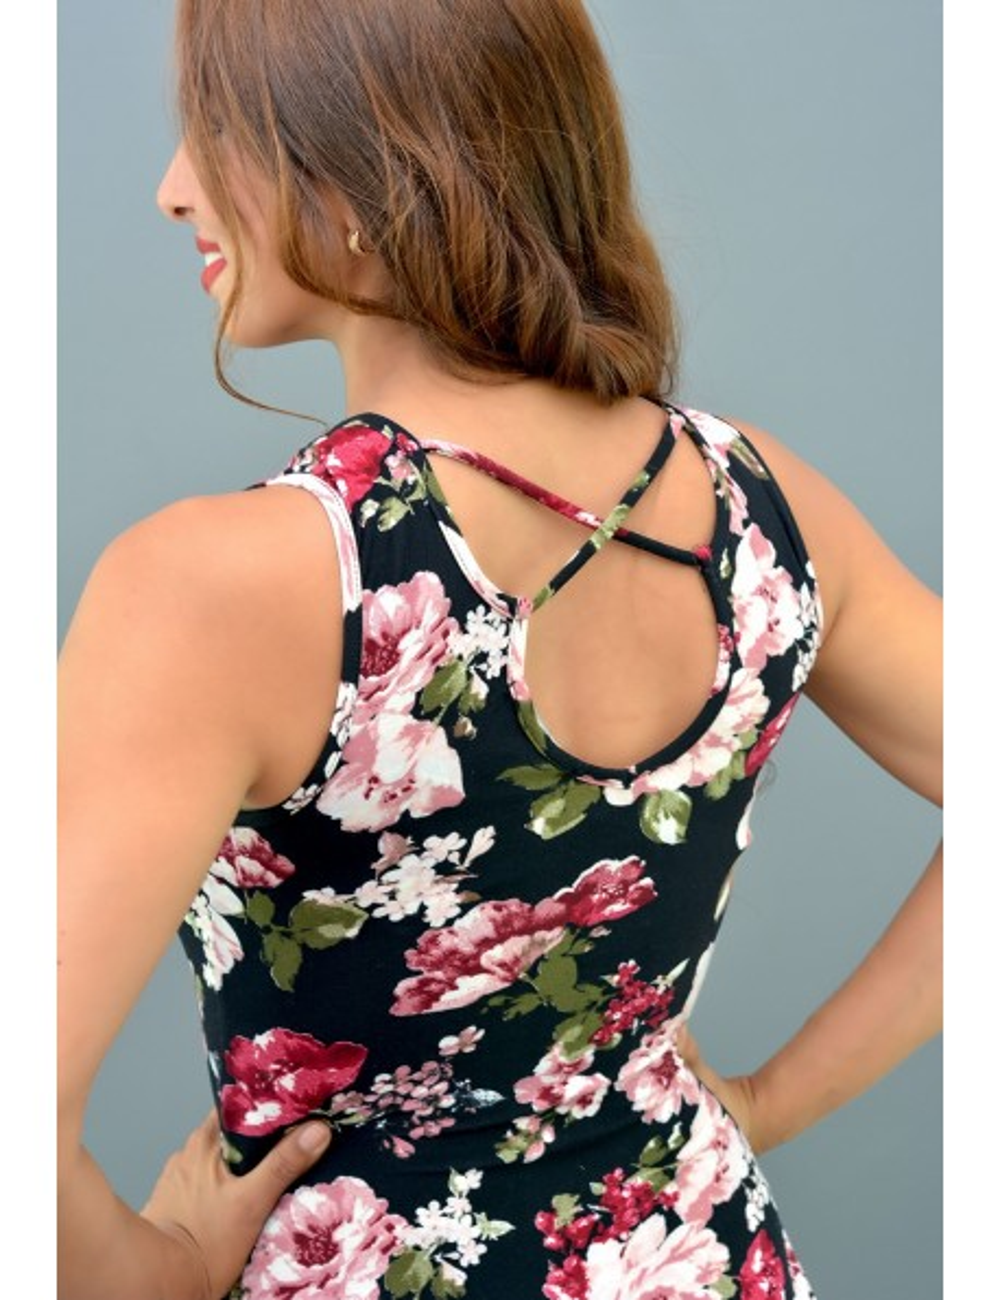 Leotardo negro flores rosadas tirantes con cordones